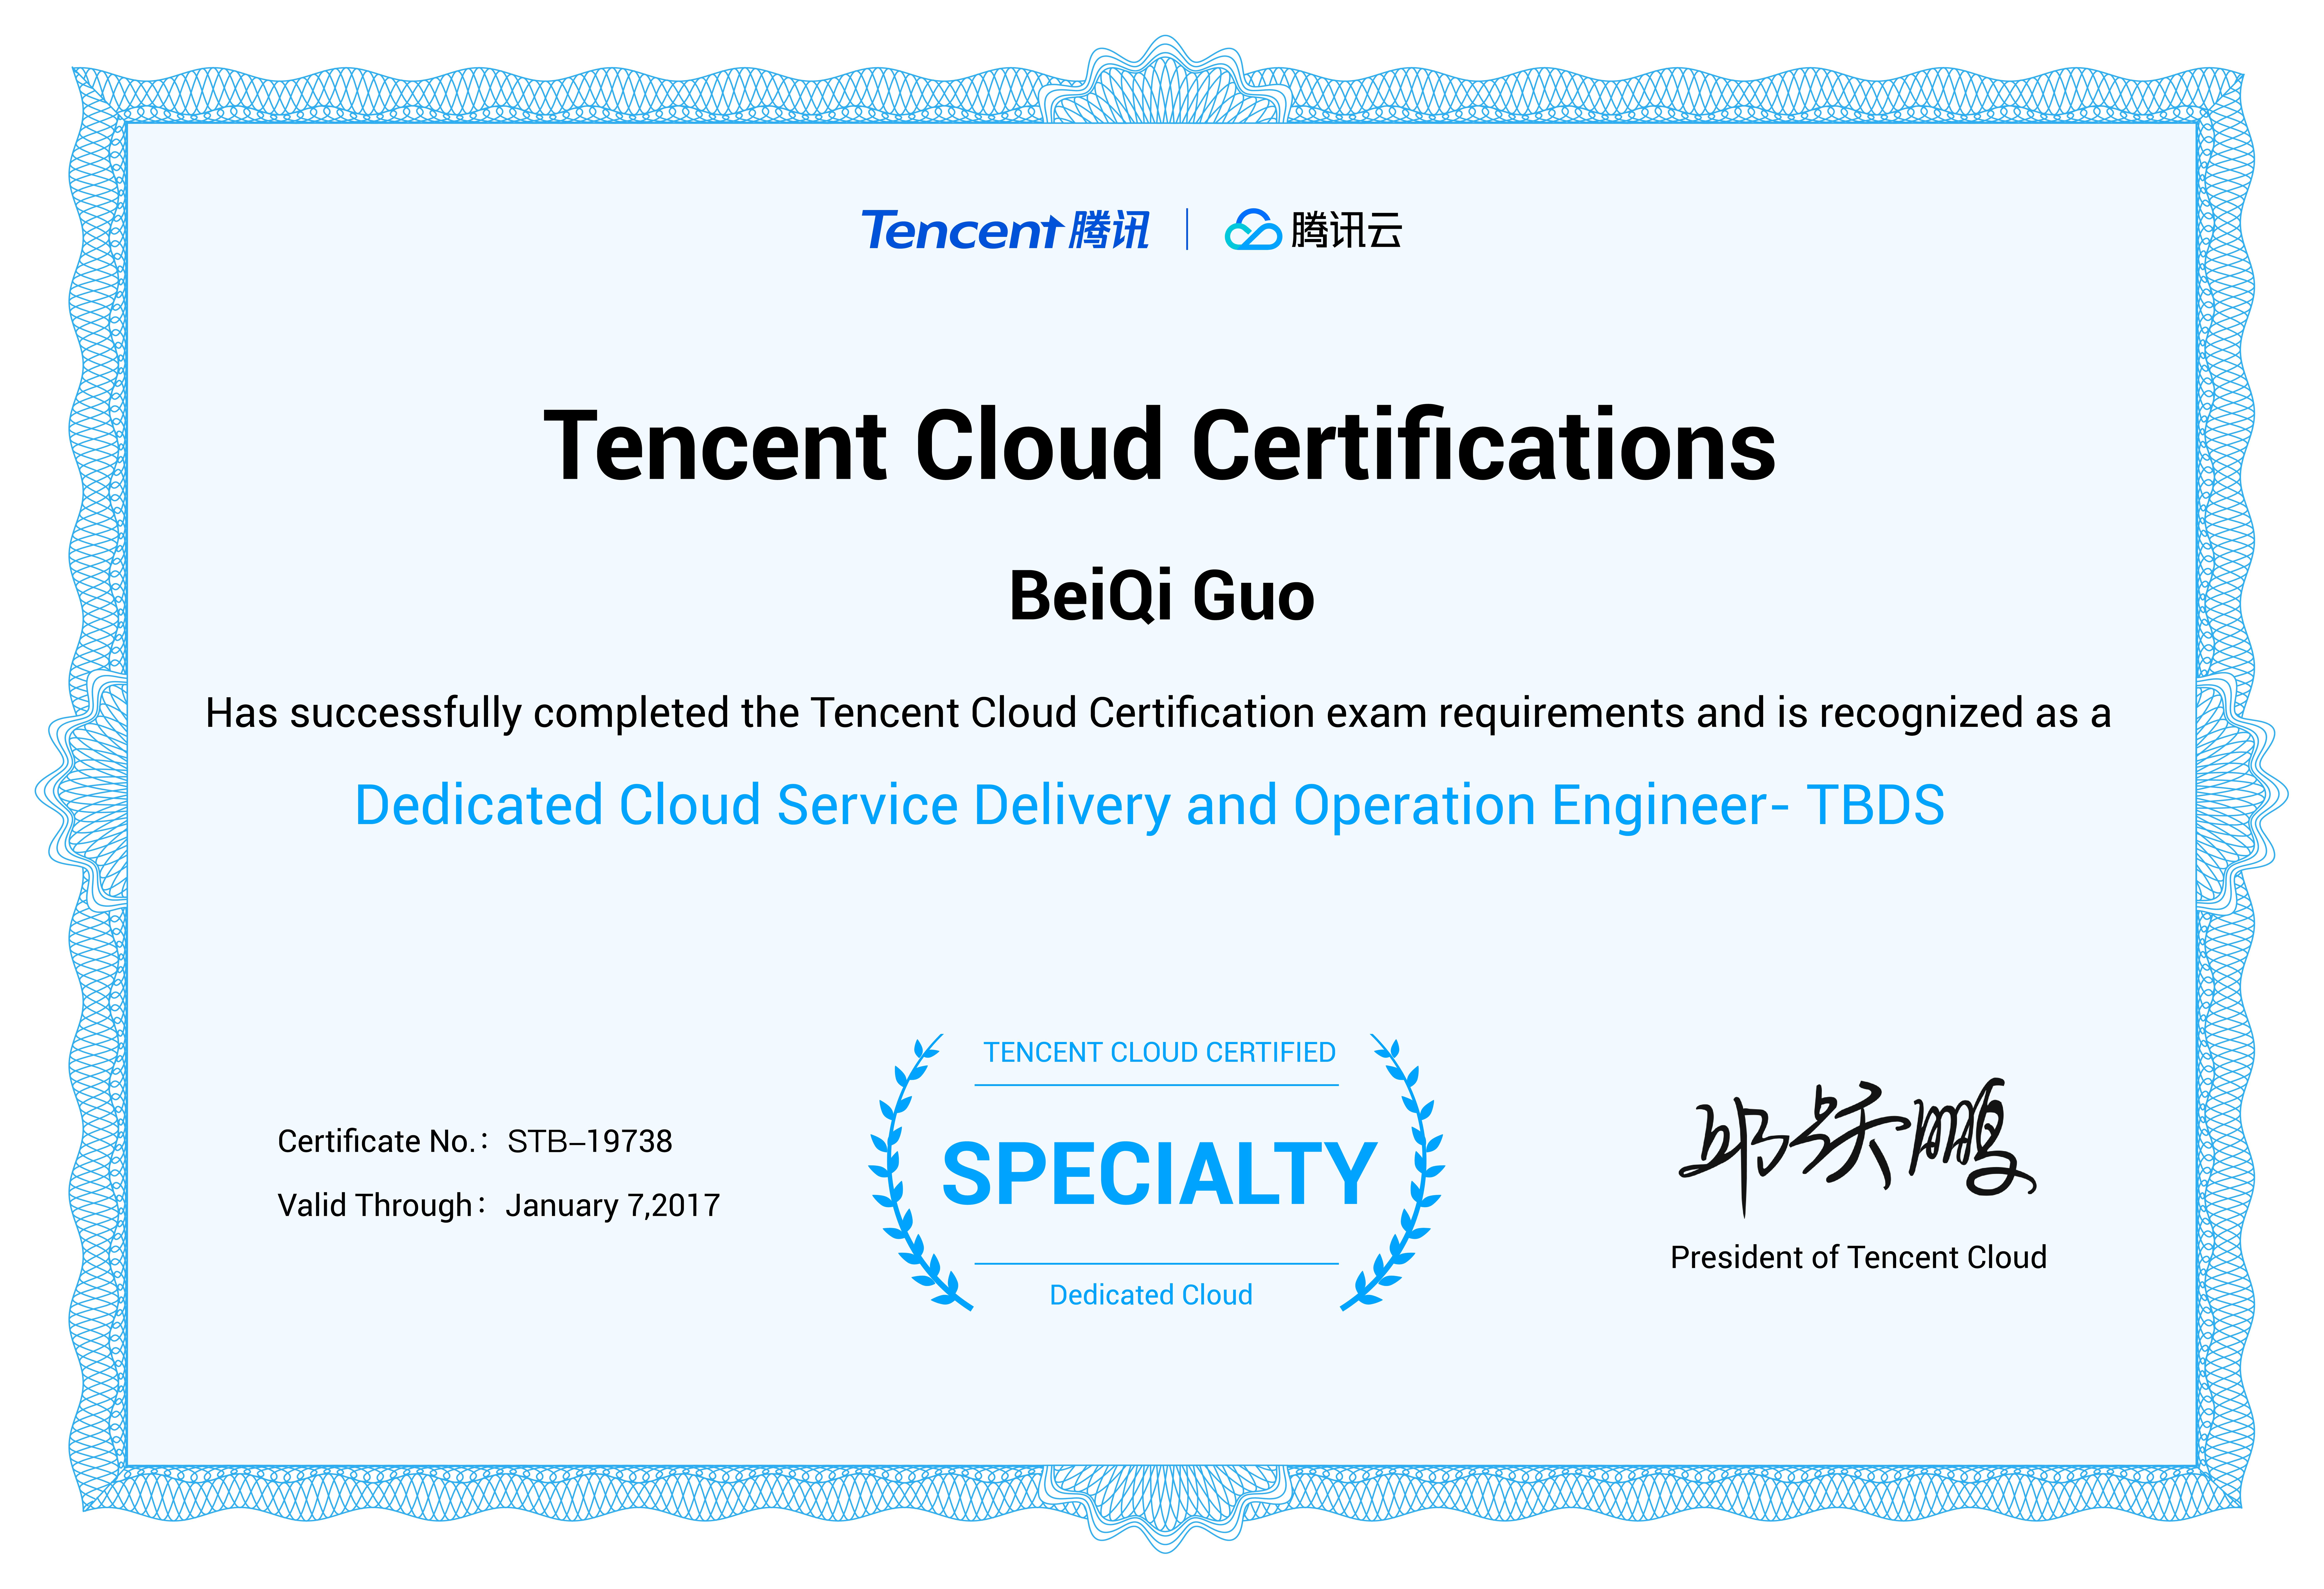 TCP权威认证证书 (2年有效)